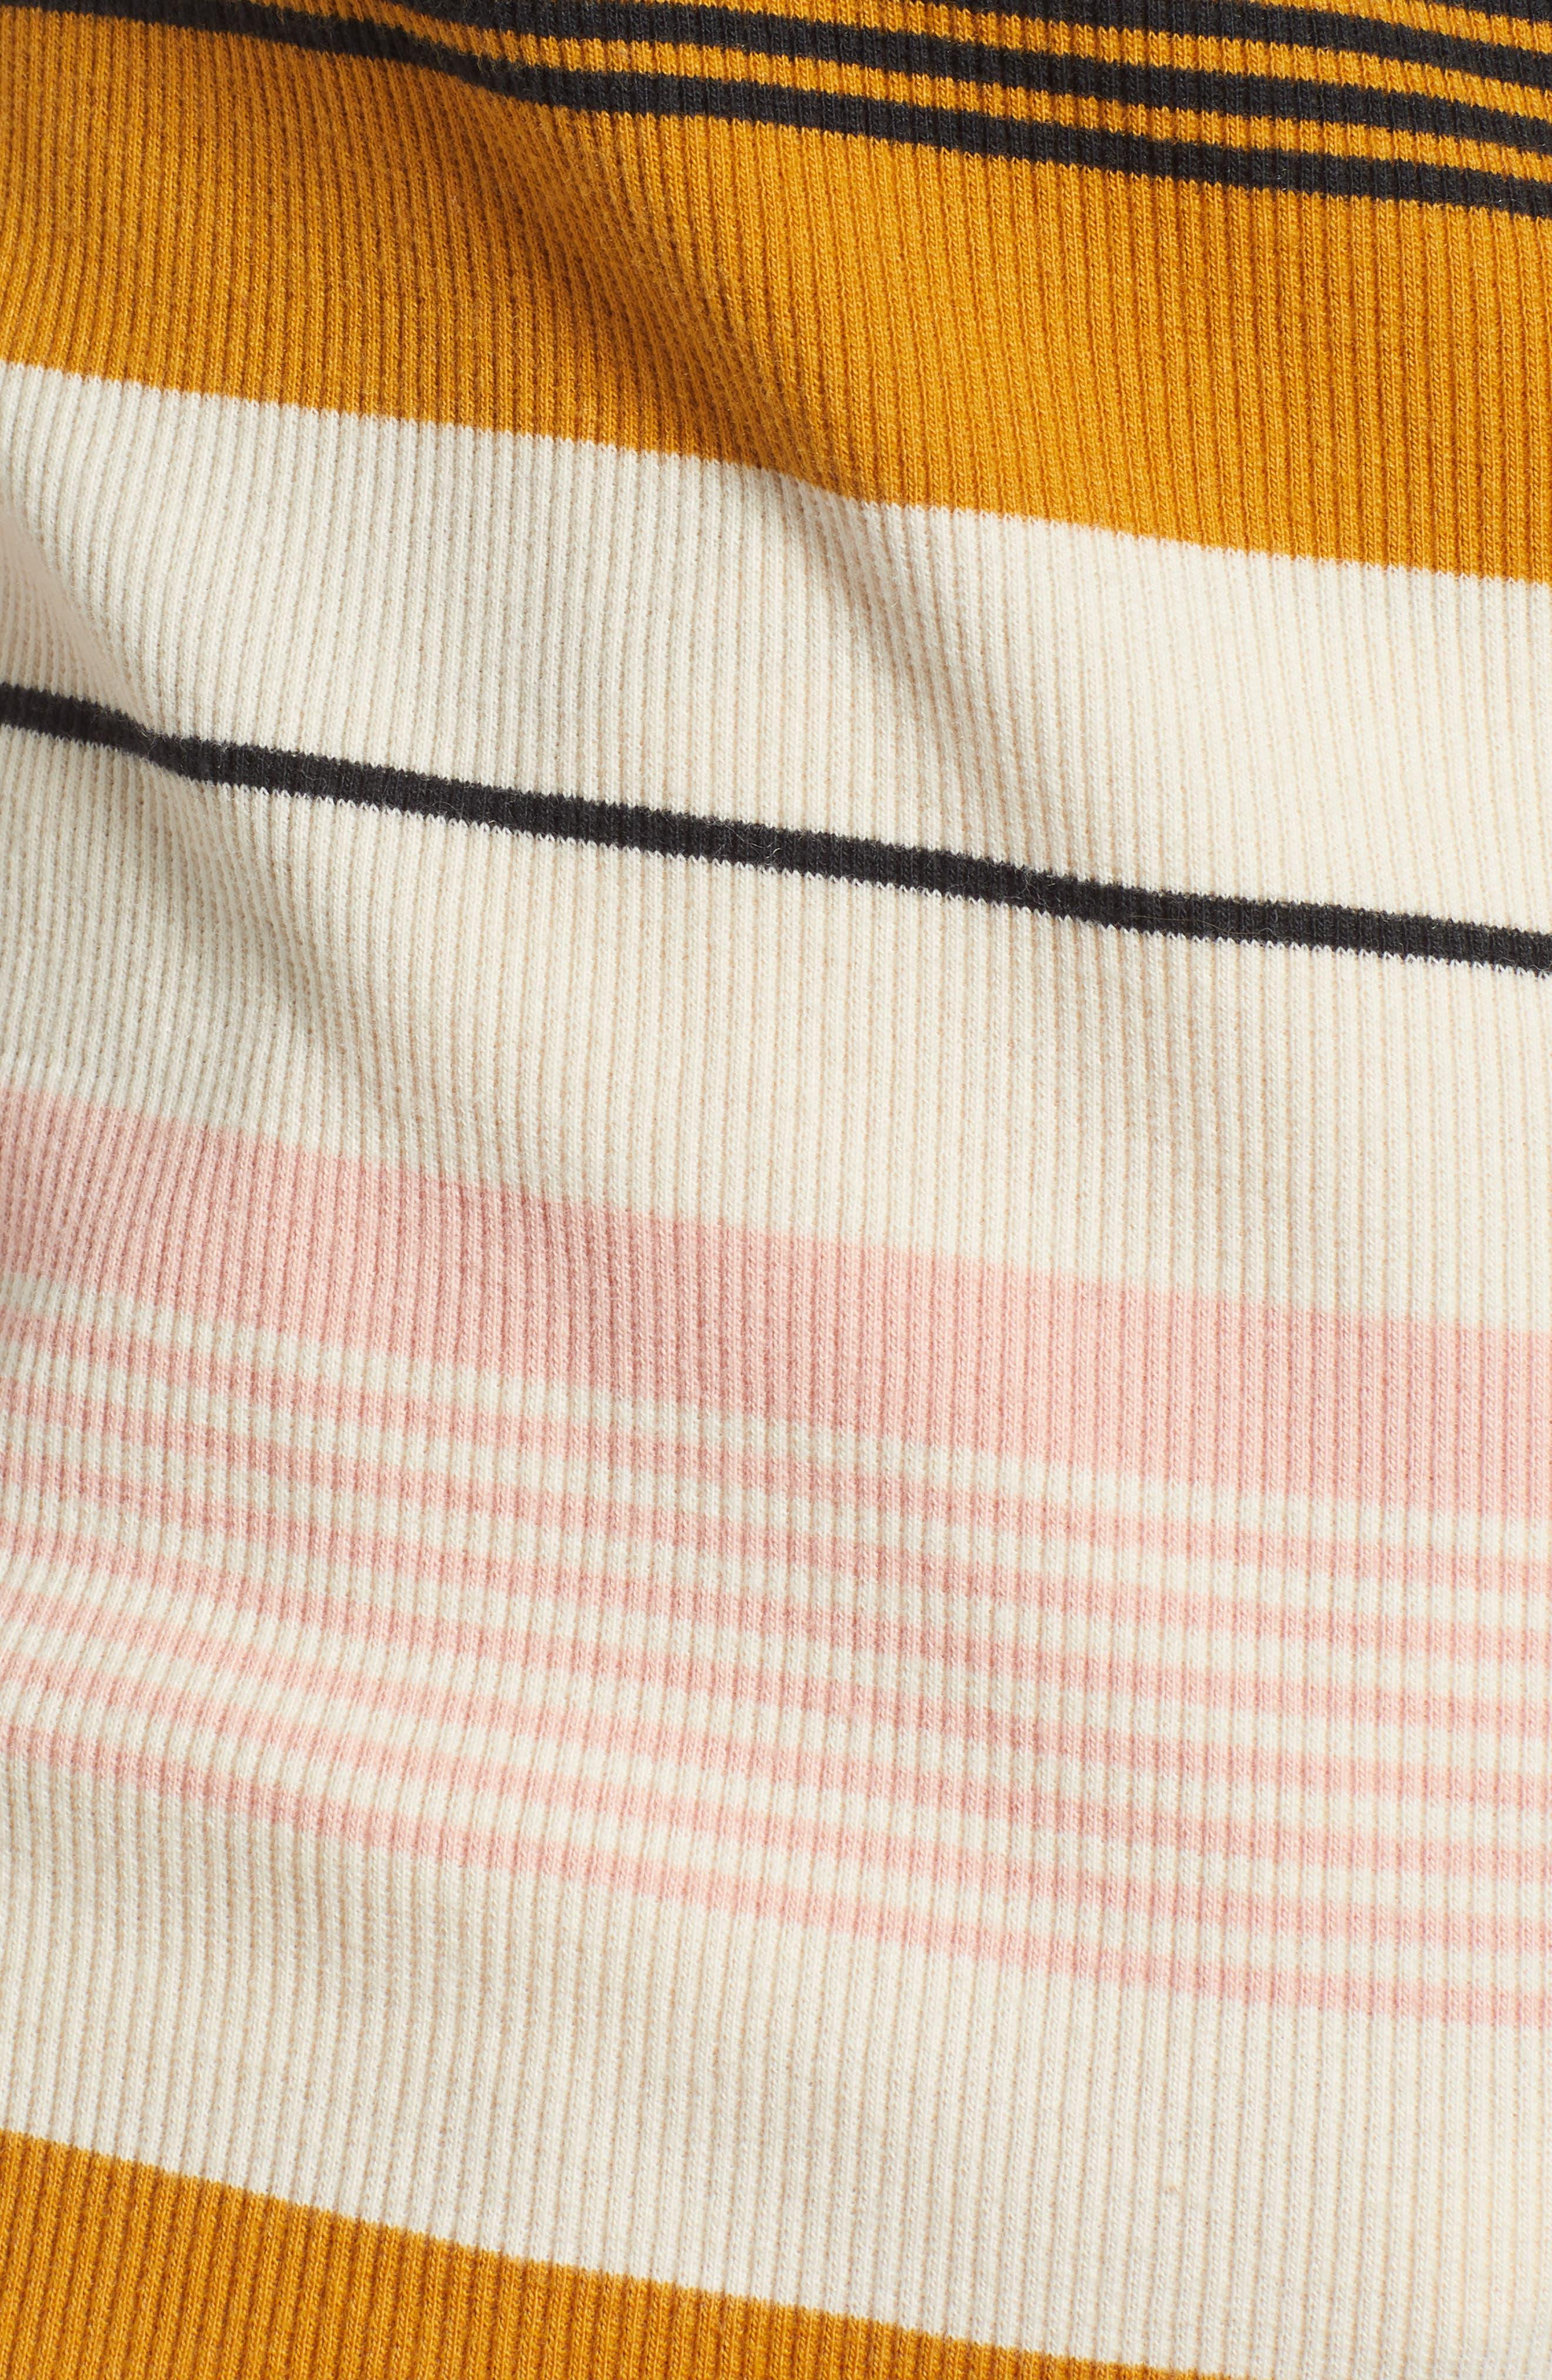 BILLABONG, Wrap City Stripe Wrap Top, Alternate thumbnail 5, color, 100